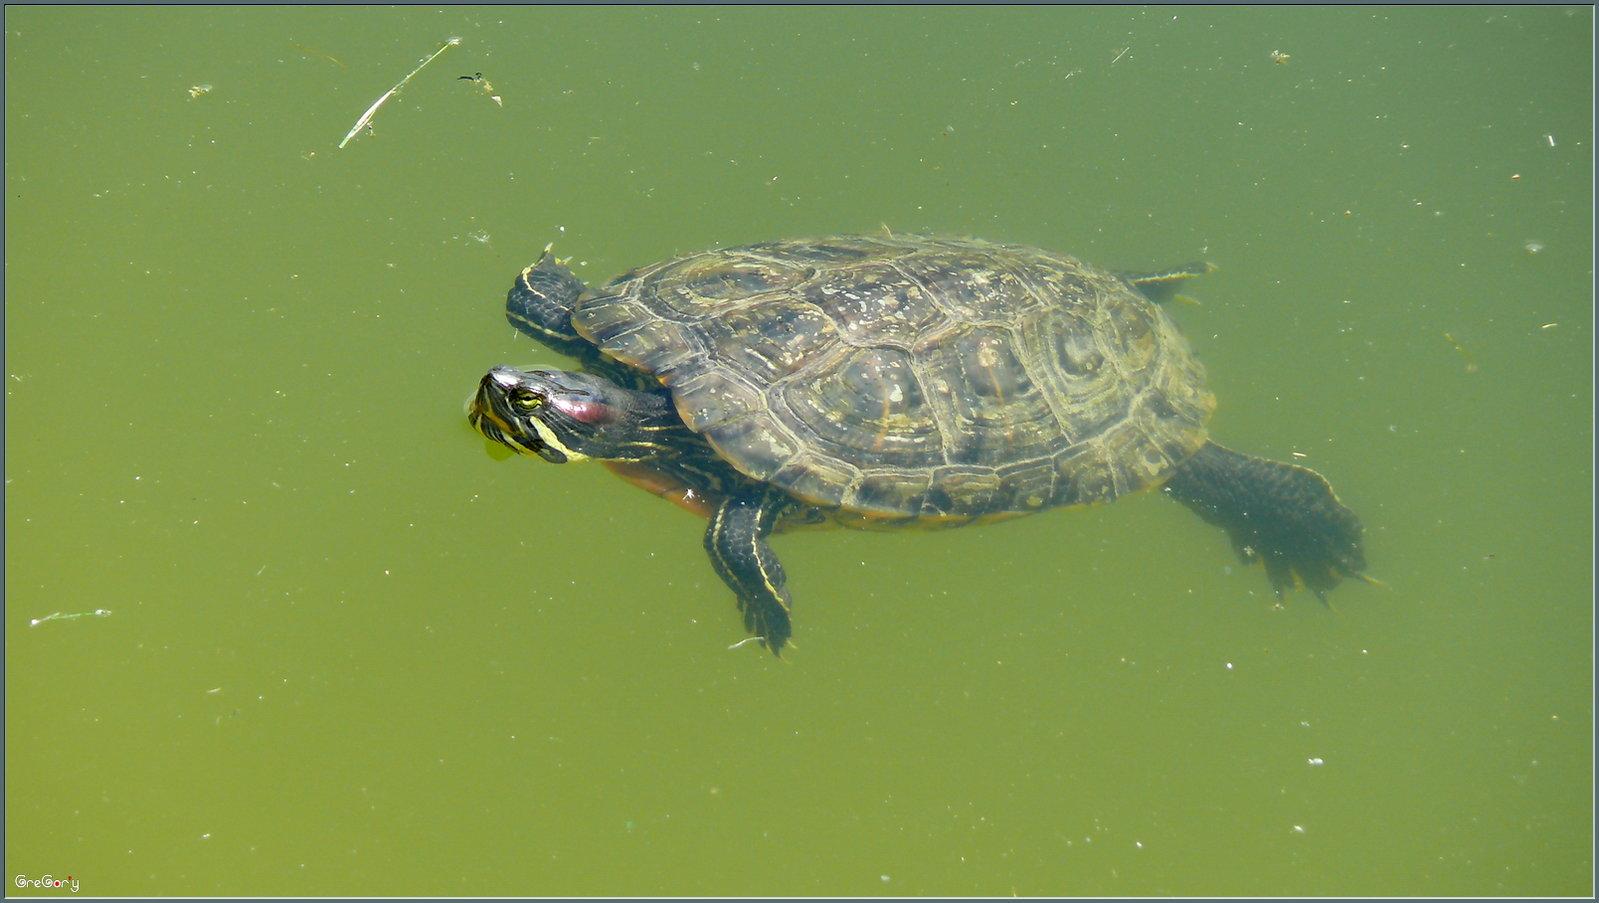 http://s2.hostingkartinok.com/uploads/images/2012/09/0167061211dcb37890db2c2ddf56df85.jpg